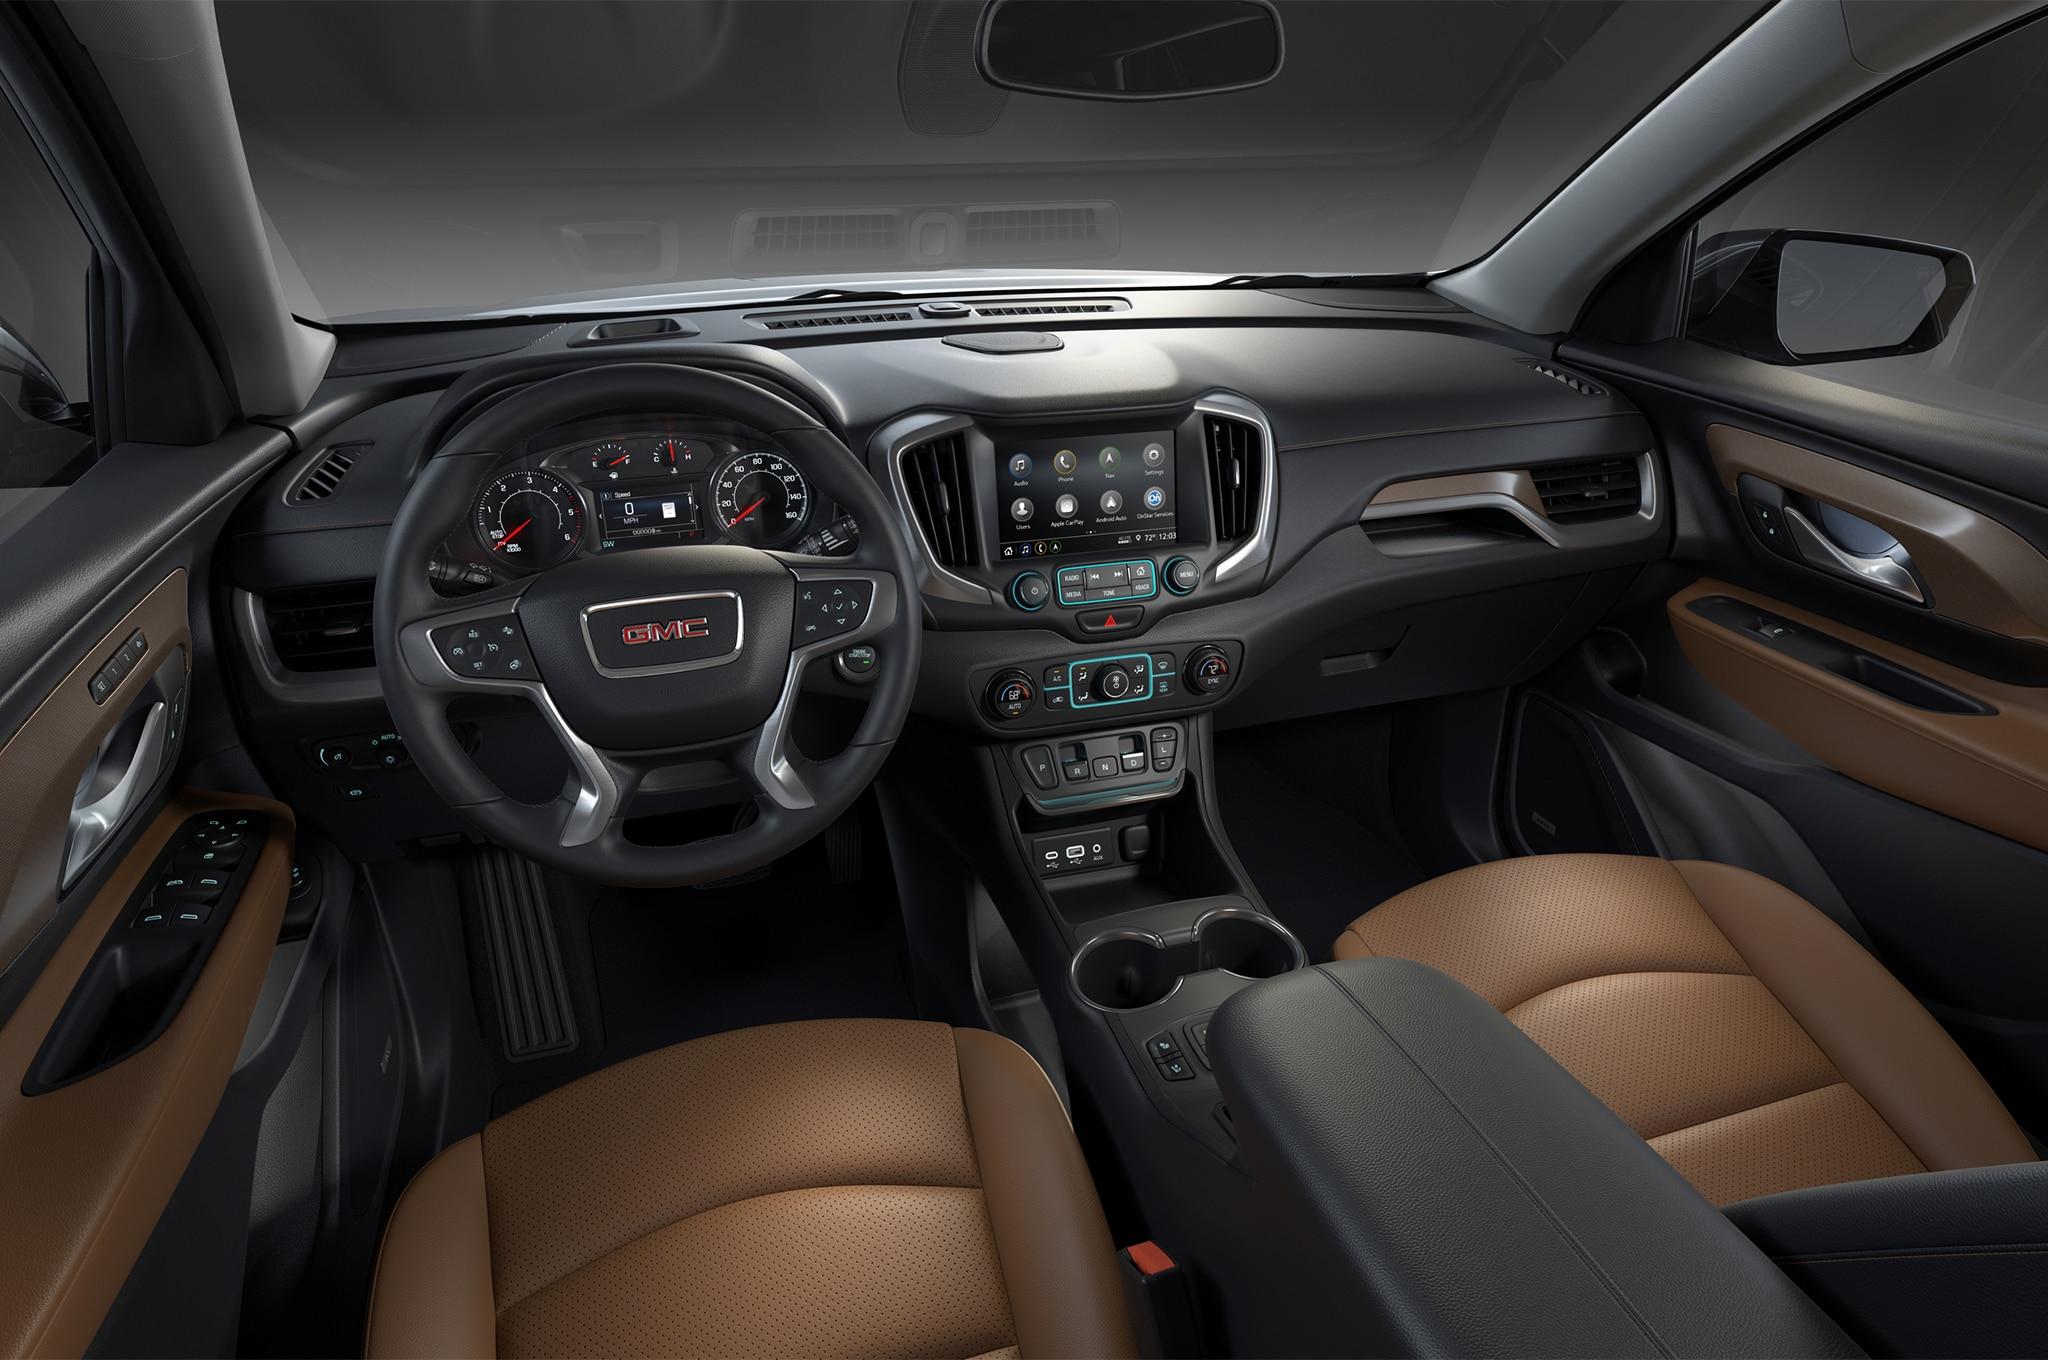 2018 gmc terrain interior. delighful interior show more inside 2018 gmc terrain interior e